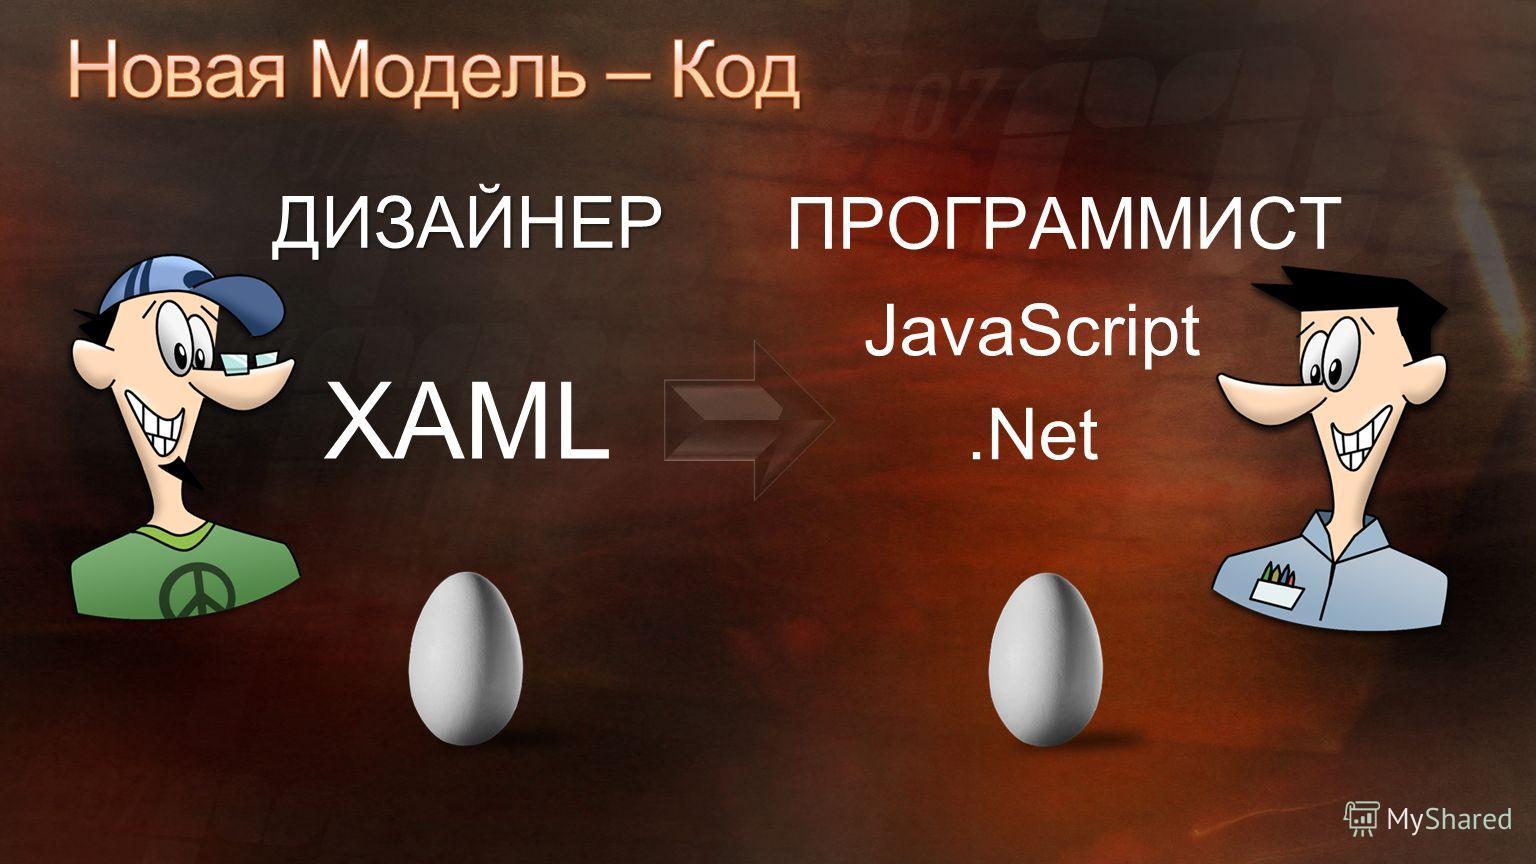 ДИЗАЙНЕР ПРОГРАММИСТ XAML JavaScript.Net